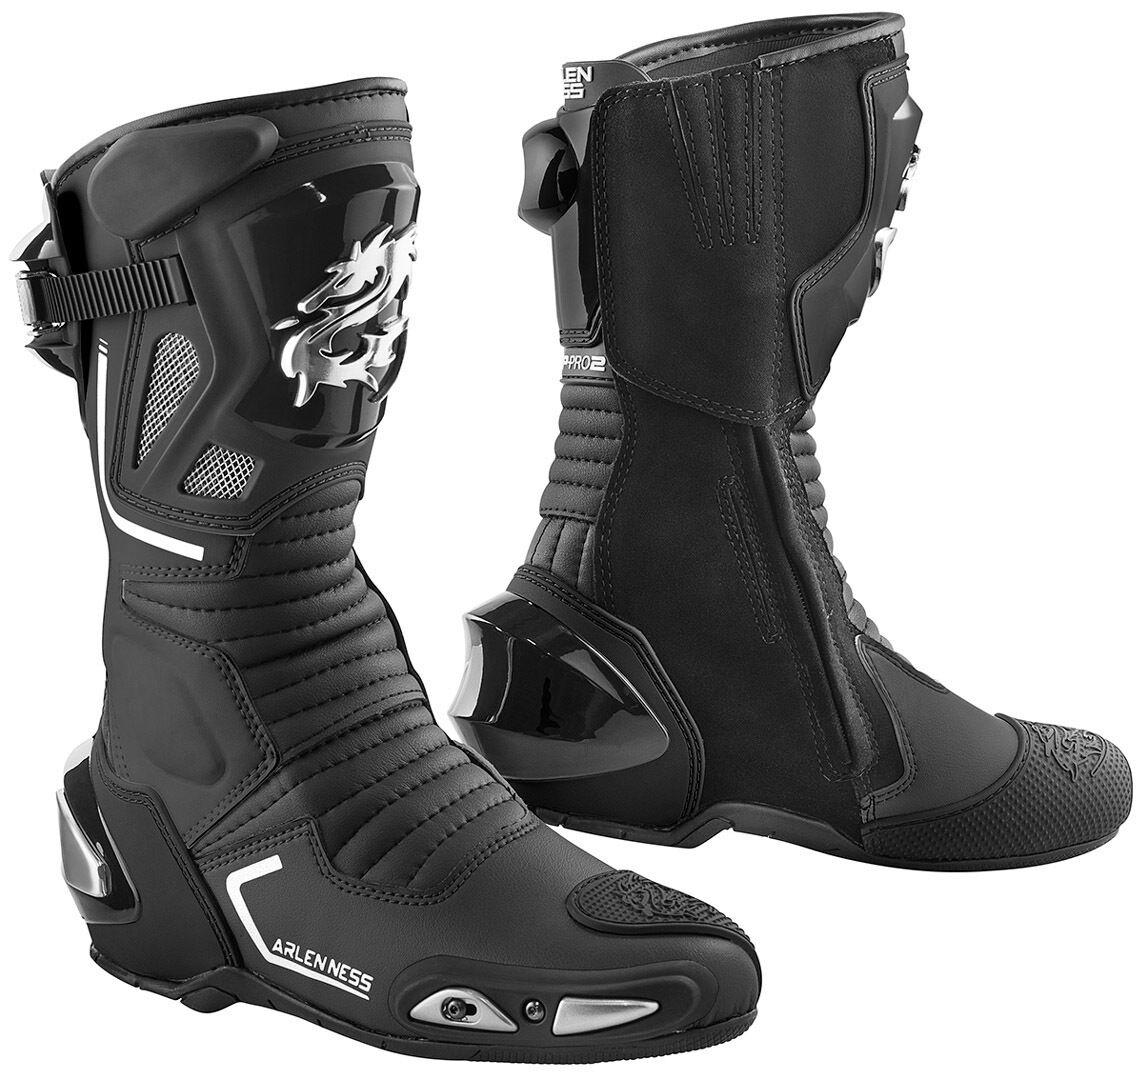 Arlen Ness Sugello Bottes de moto Noir taille : 39